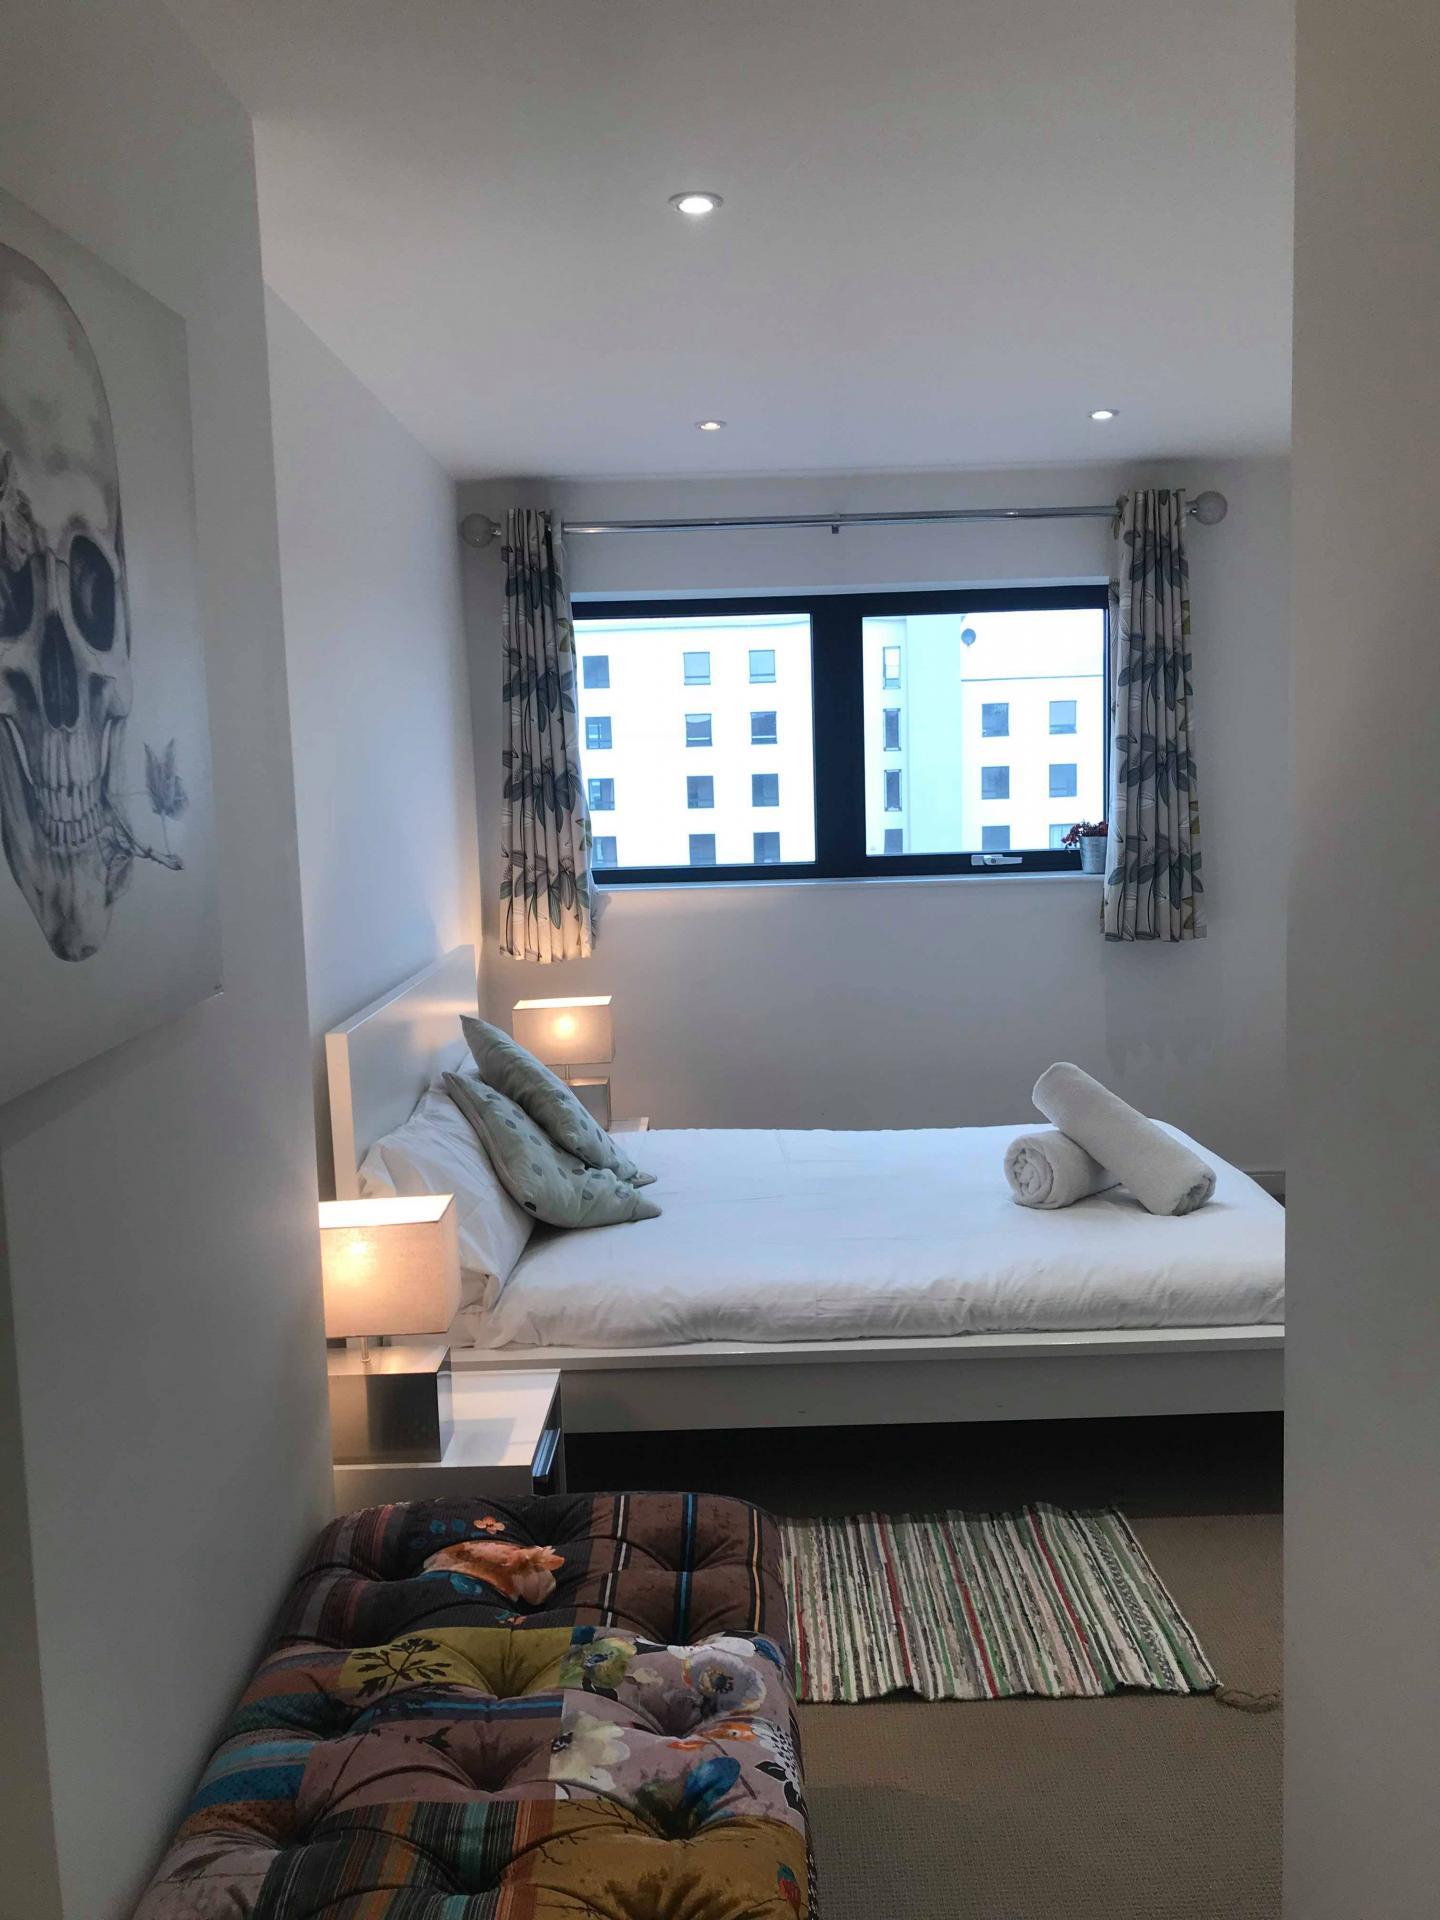 Bed at Ocean Village Serviced Apartments, Ocean Village, Southampton